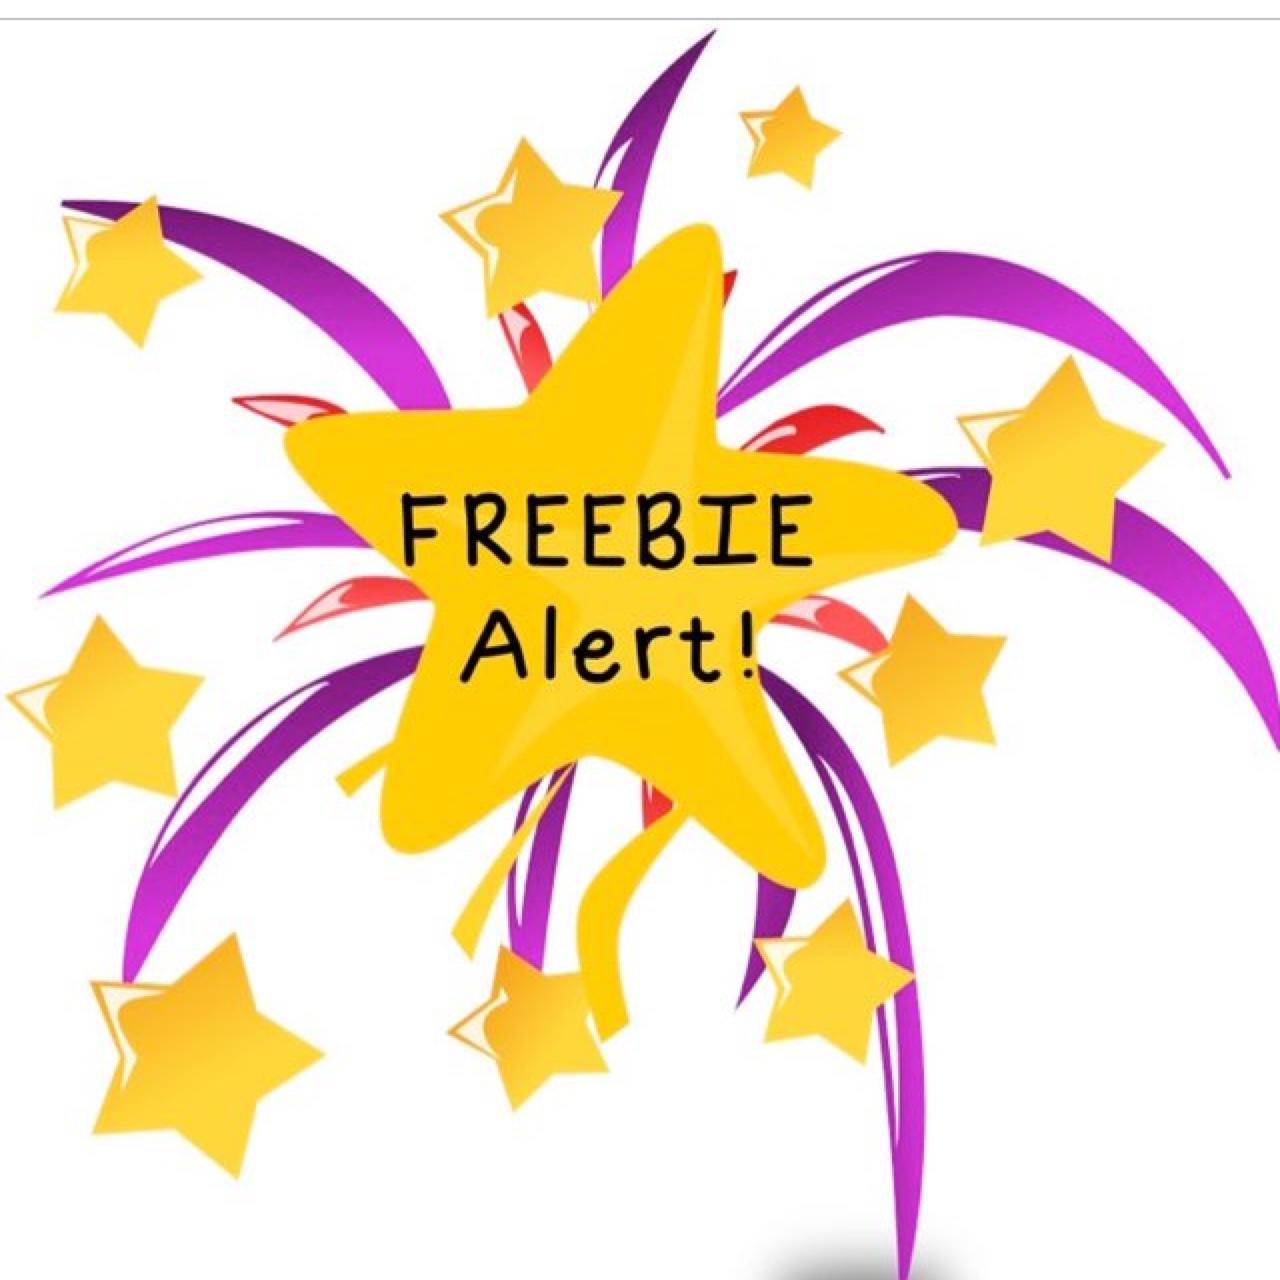 Freebie Alert